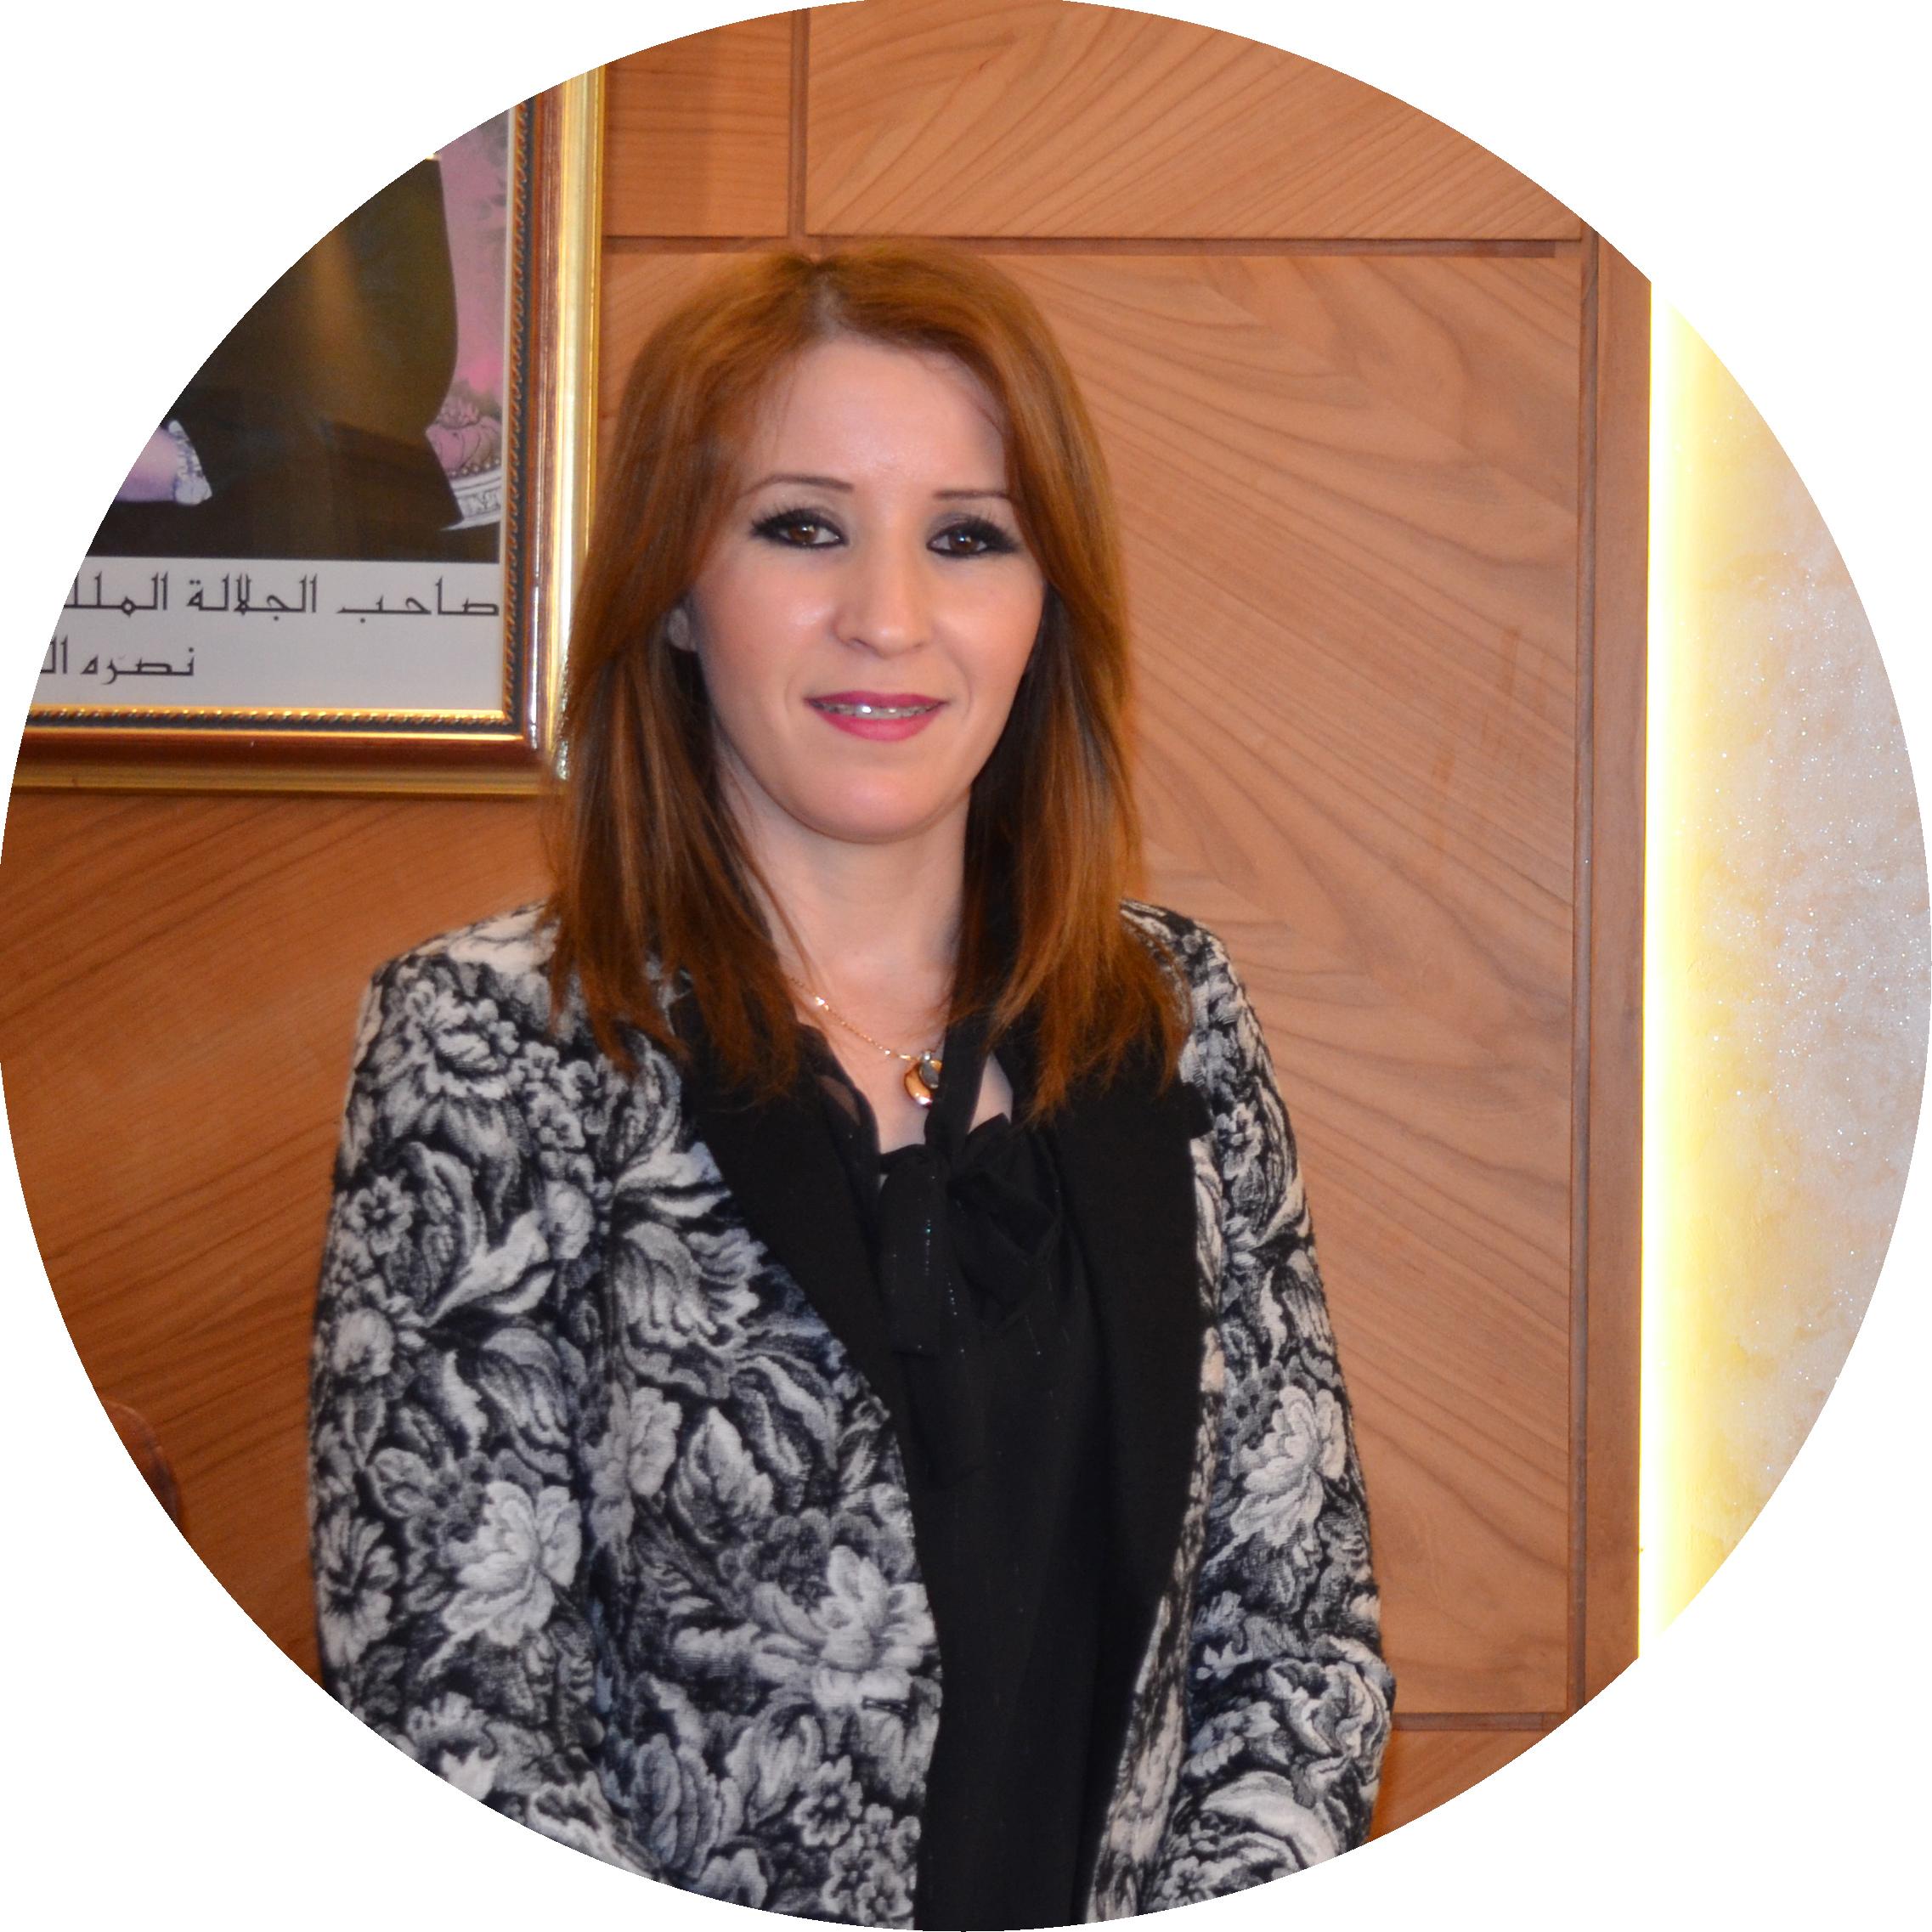 Rfia Mansouri